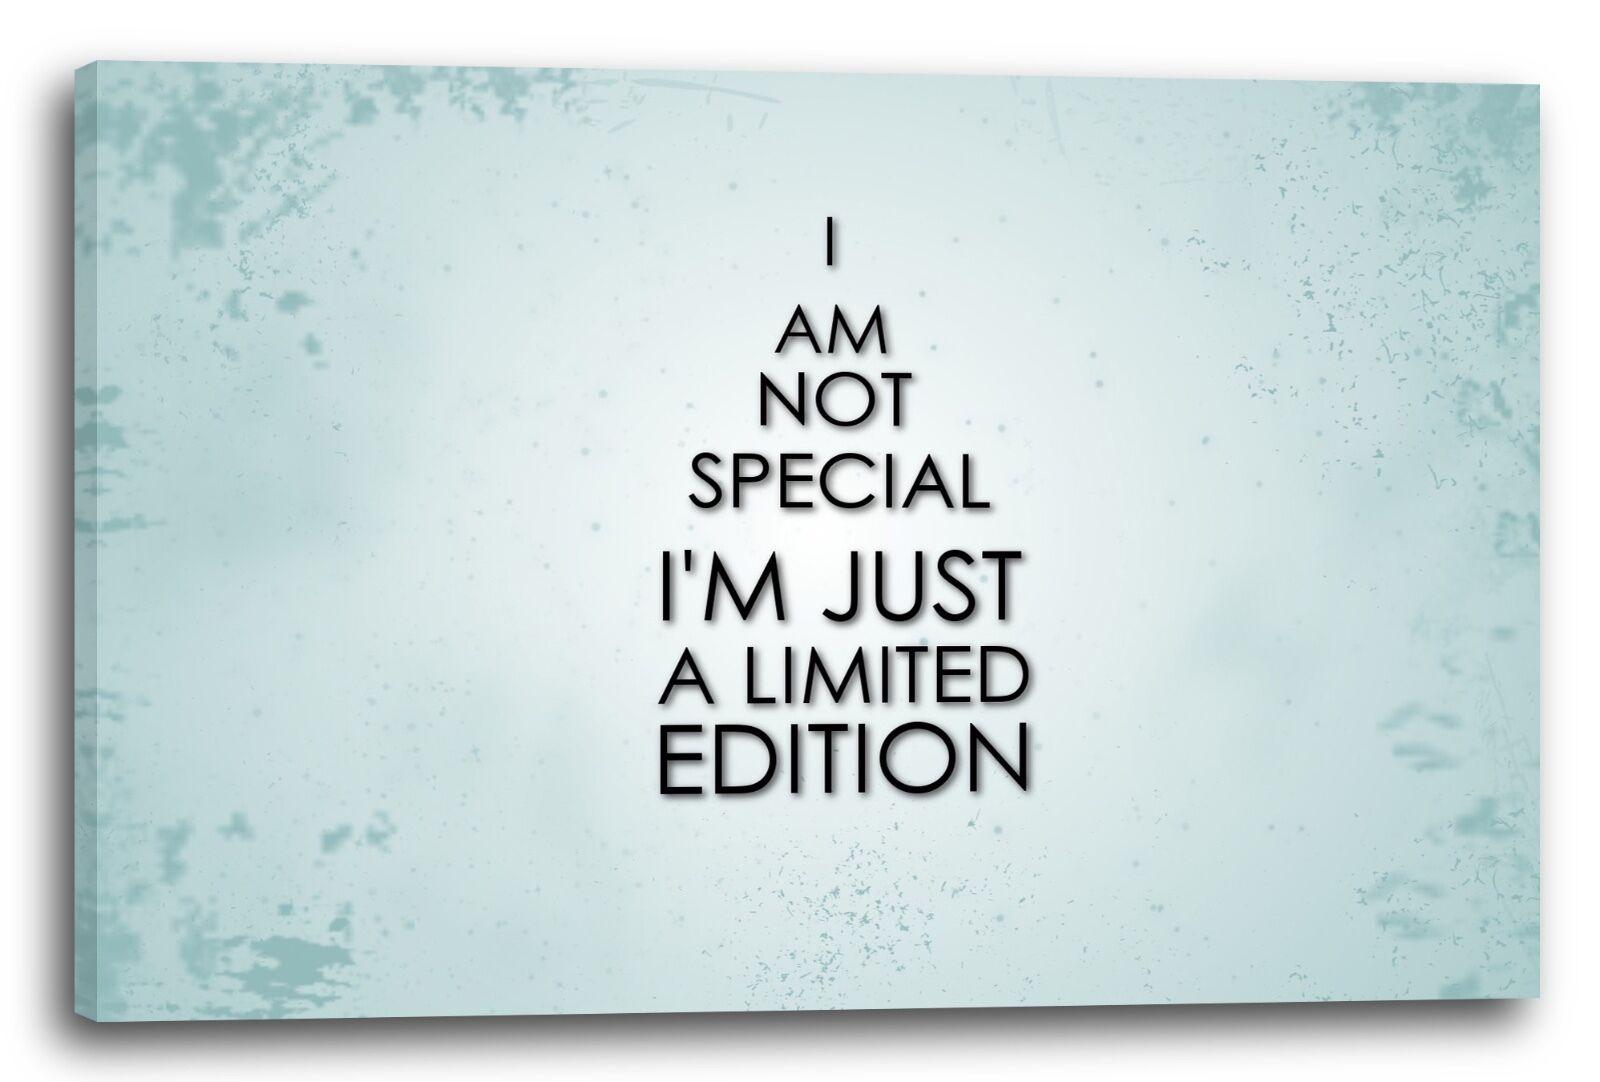 Lein-Wand-Bild Kooler Spruch, ich bin limited edition, Zitate Quotes funny witzi